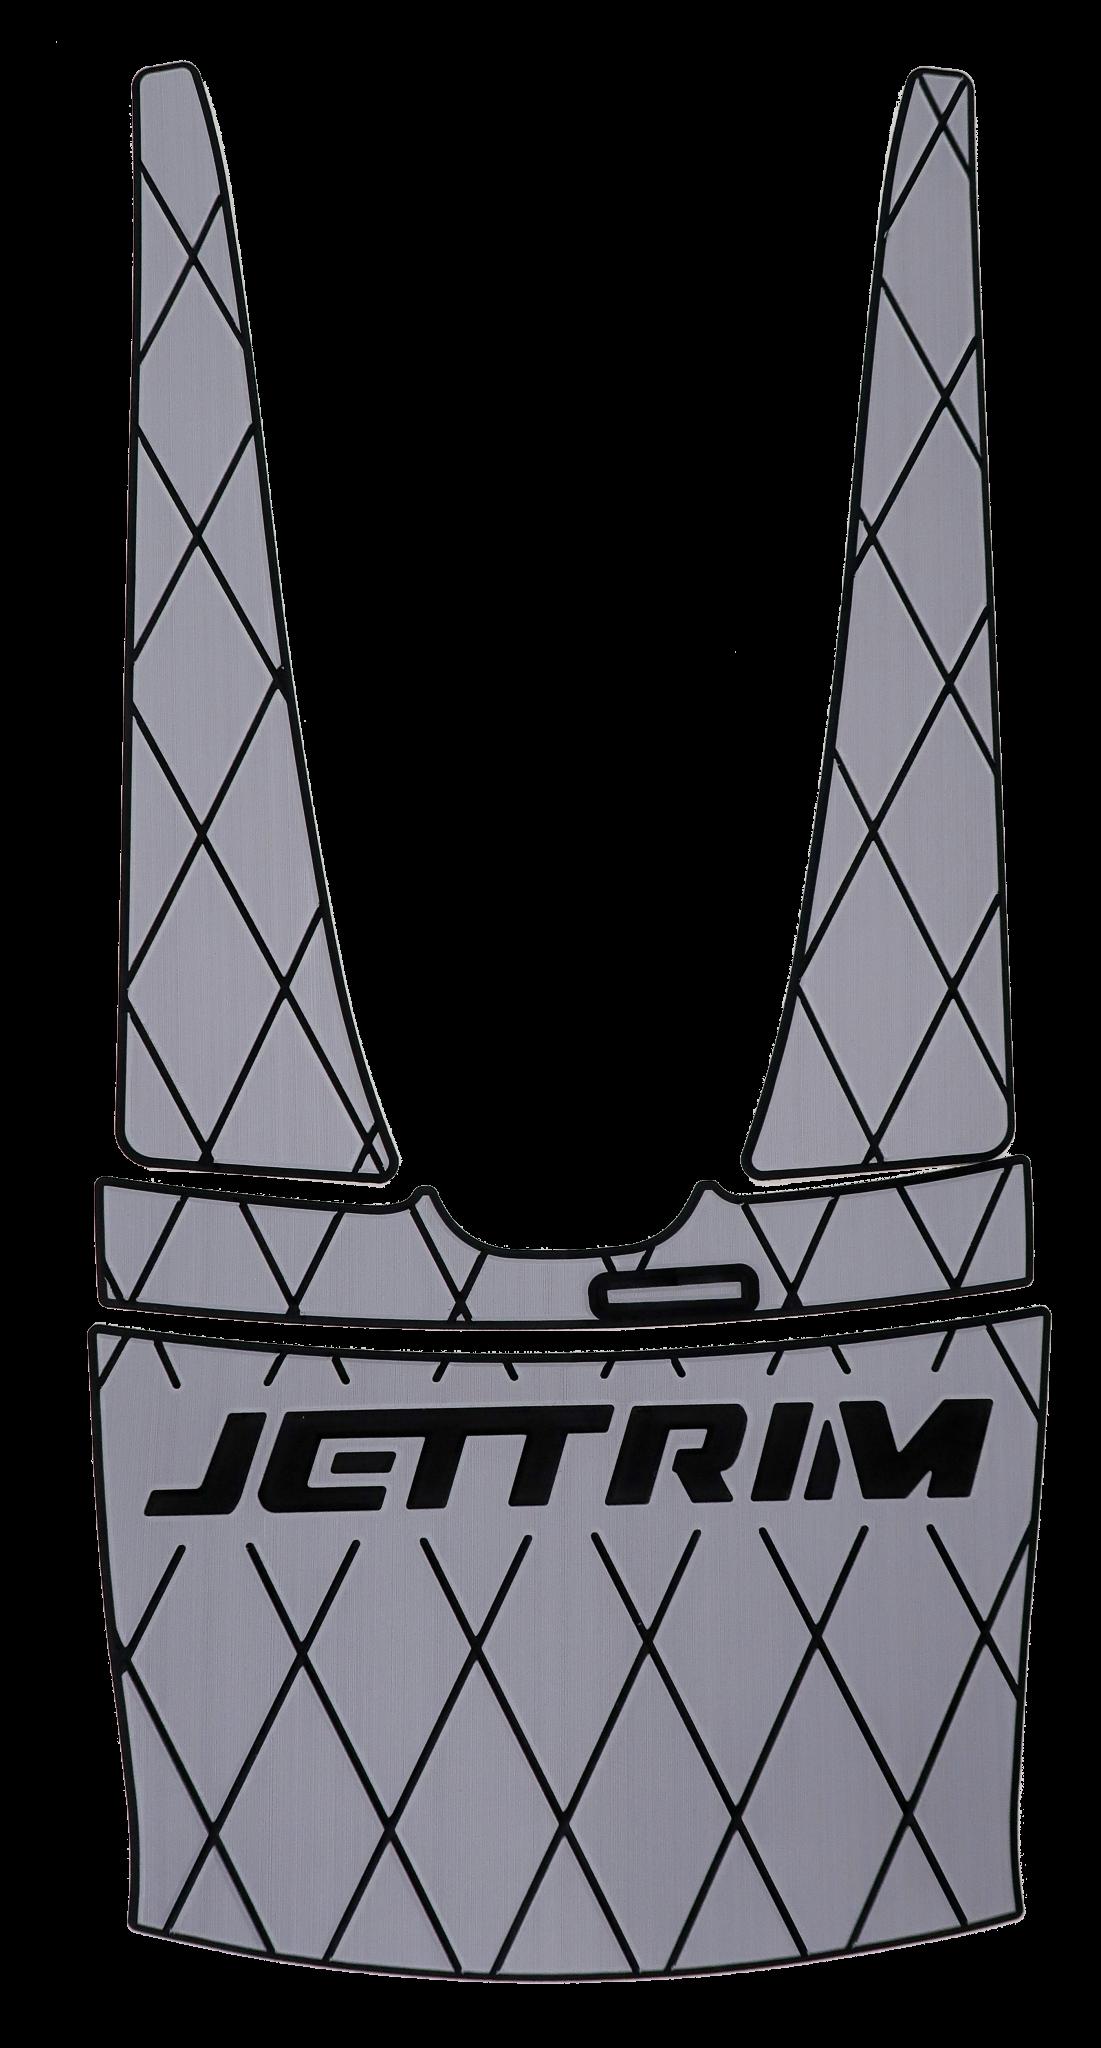 Wave Blaster Jettrim Turf Mats